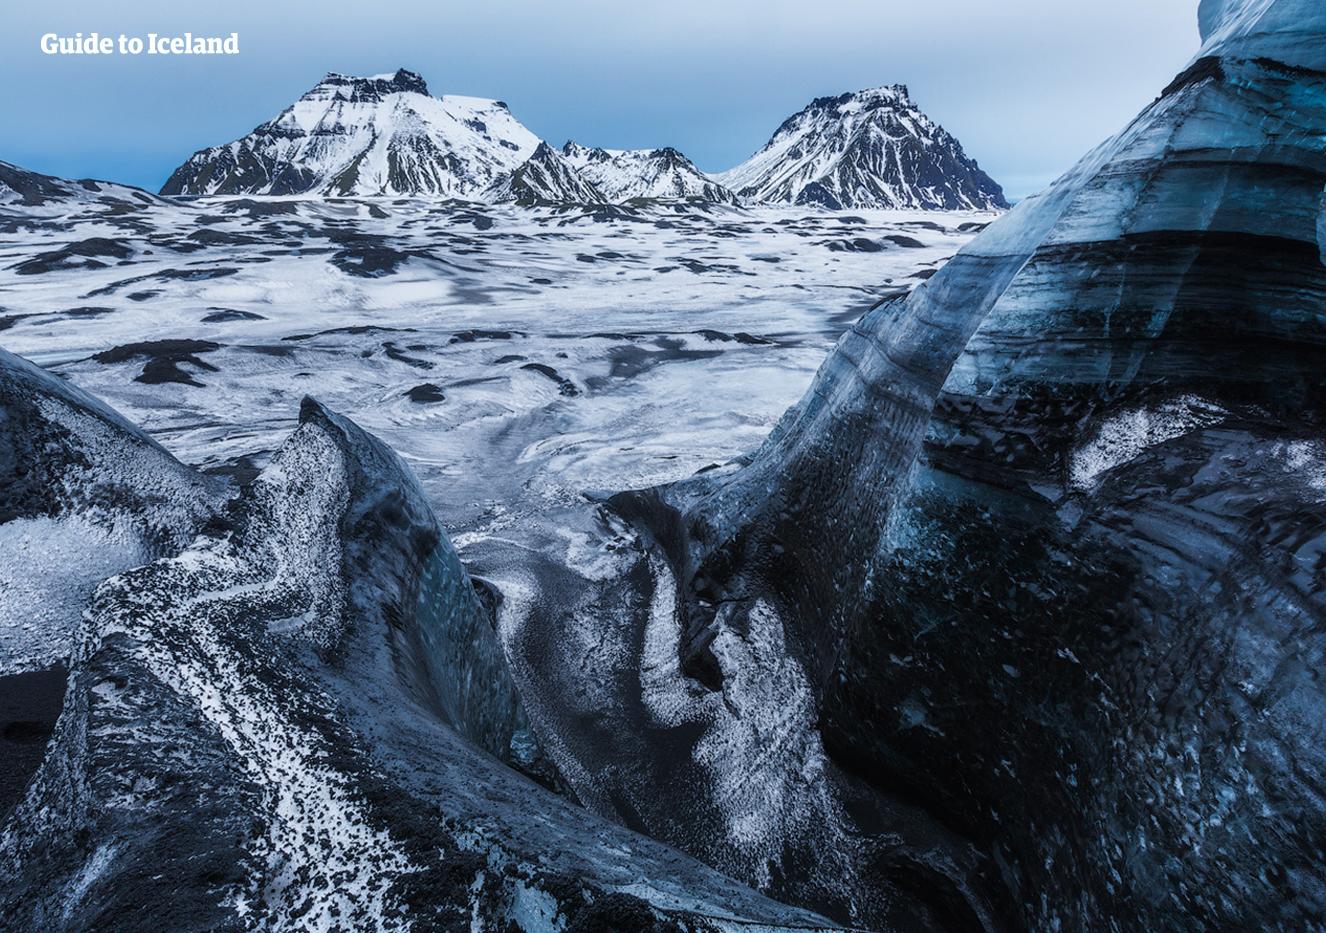 islandia-guide-to-iceland-5